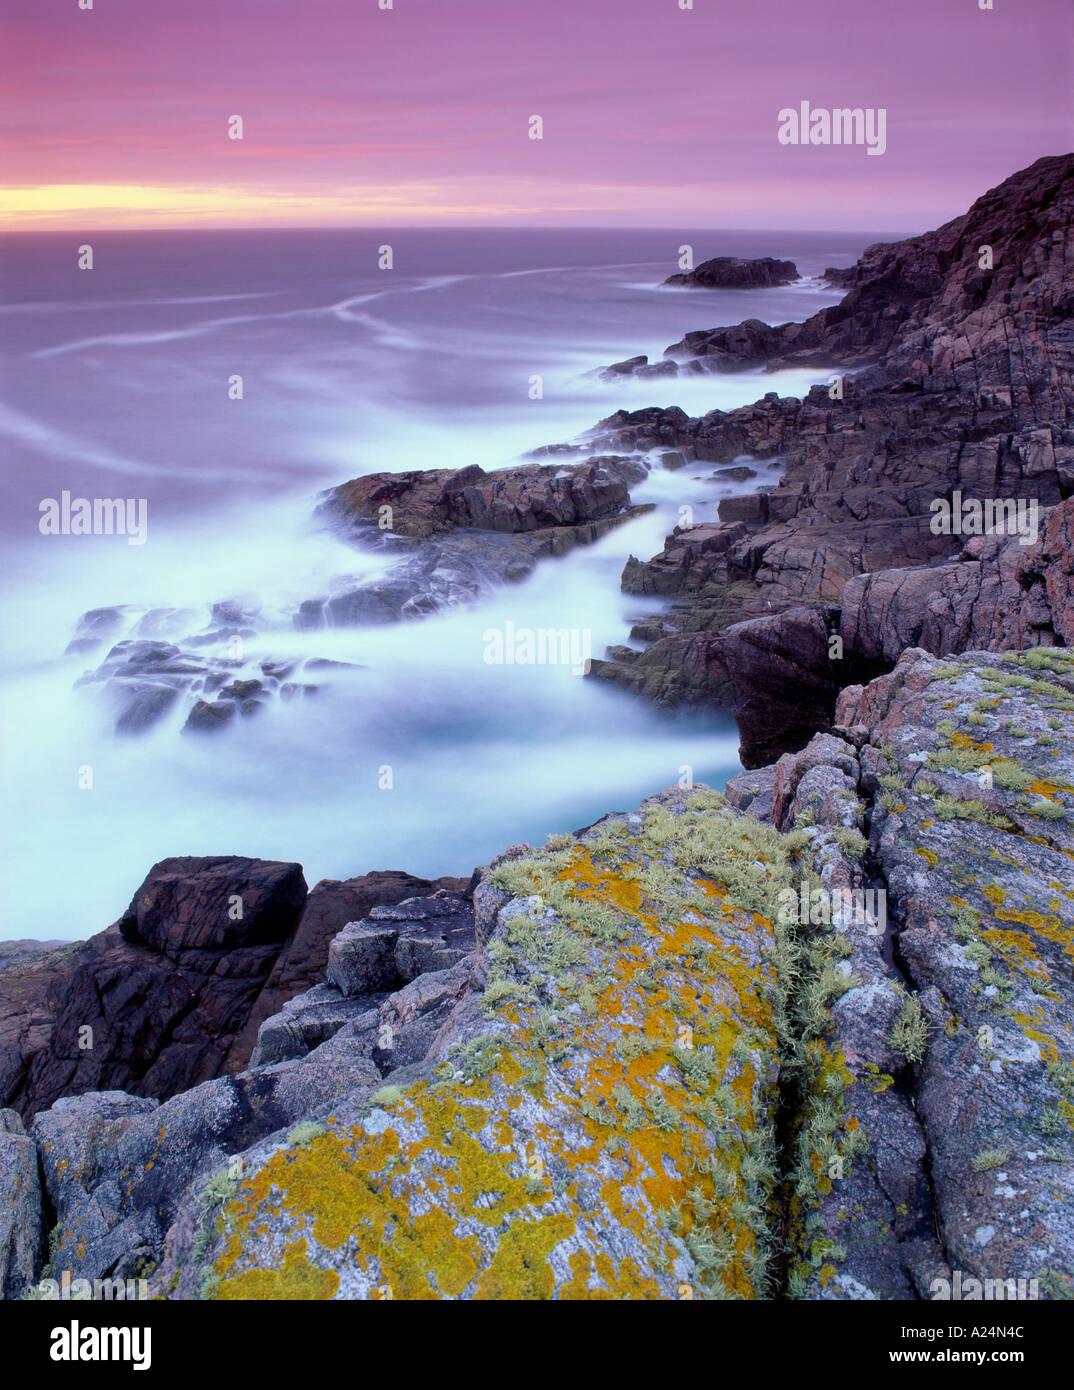 Cerca de la costa, cerca de Kinlochbervie Sheigra, Sutherland, Highland, Scotland, Reino Unido Imagen De Stock